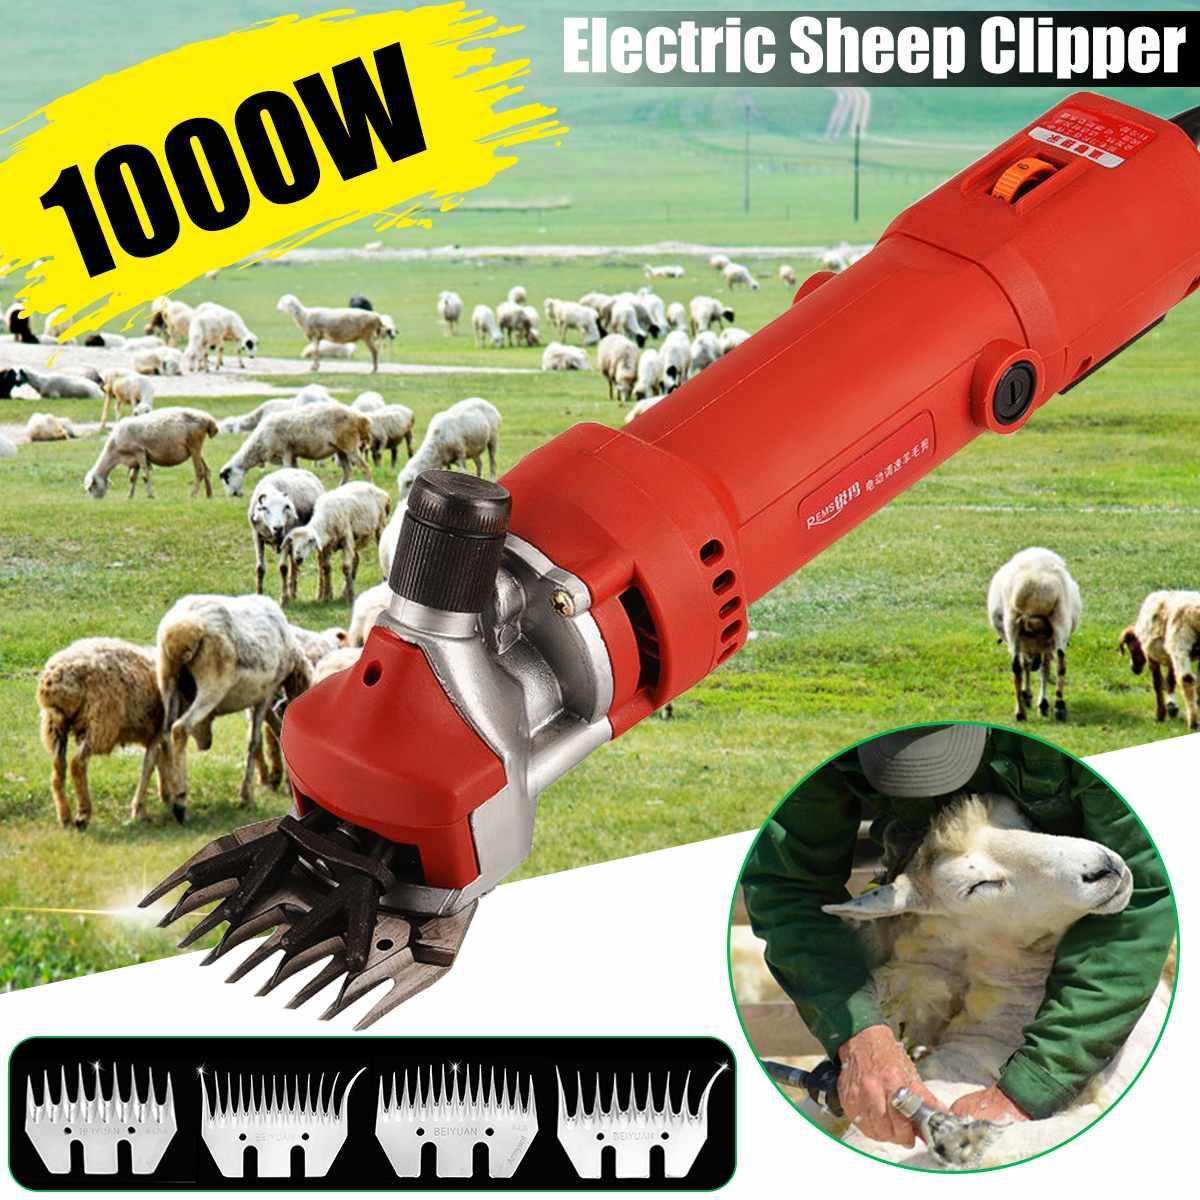 220V 1080W Electronic Shearing Clipper Sheep//Goat Animal Shear Farm Livestock